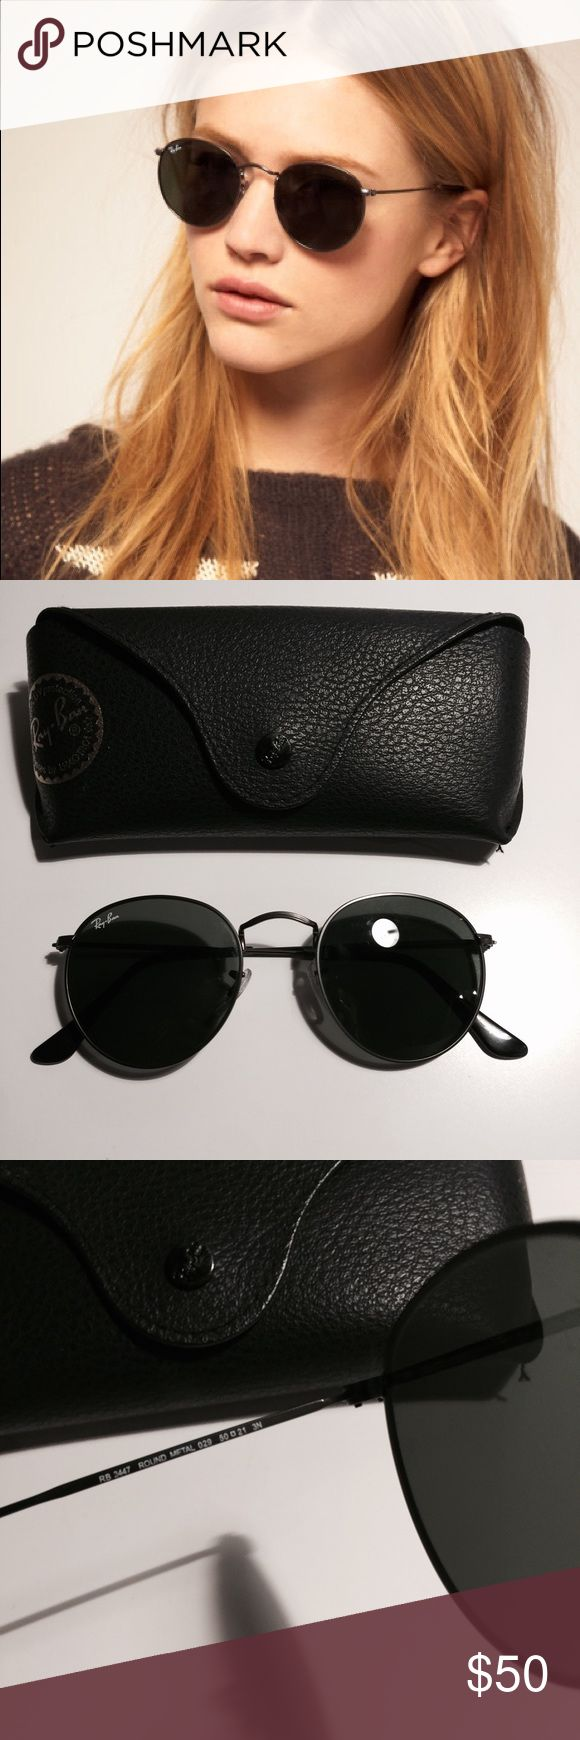 Ray Ban Black Round Metal Sunglasses 3447 Ray Ban Round Metal Unisex Sunglasses 3447 | Perfect Condition Ray-Ban Accessories Sunglasses